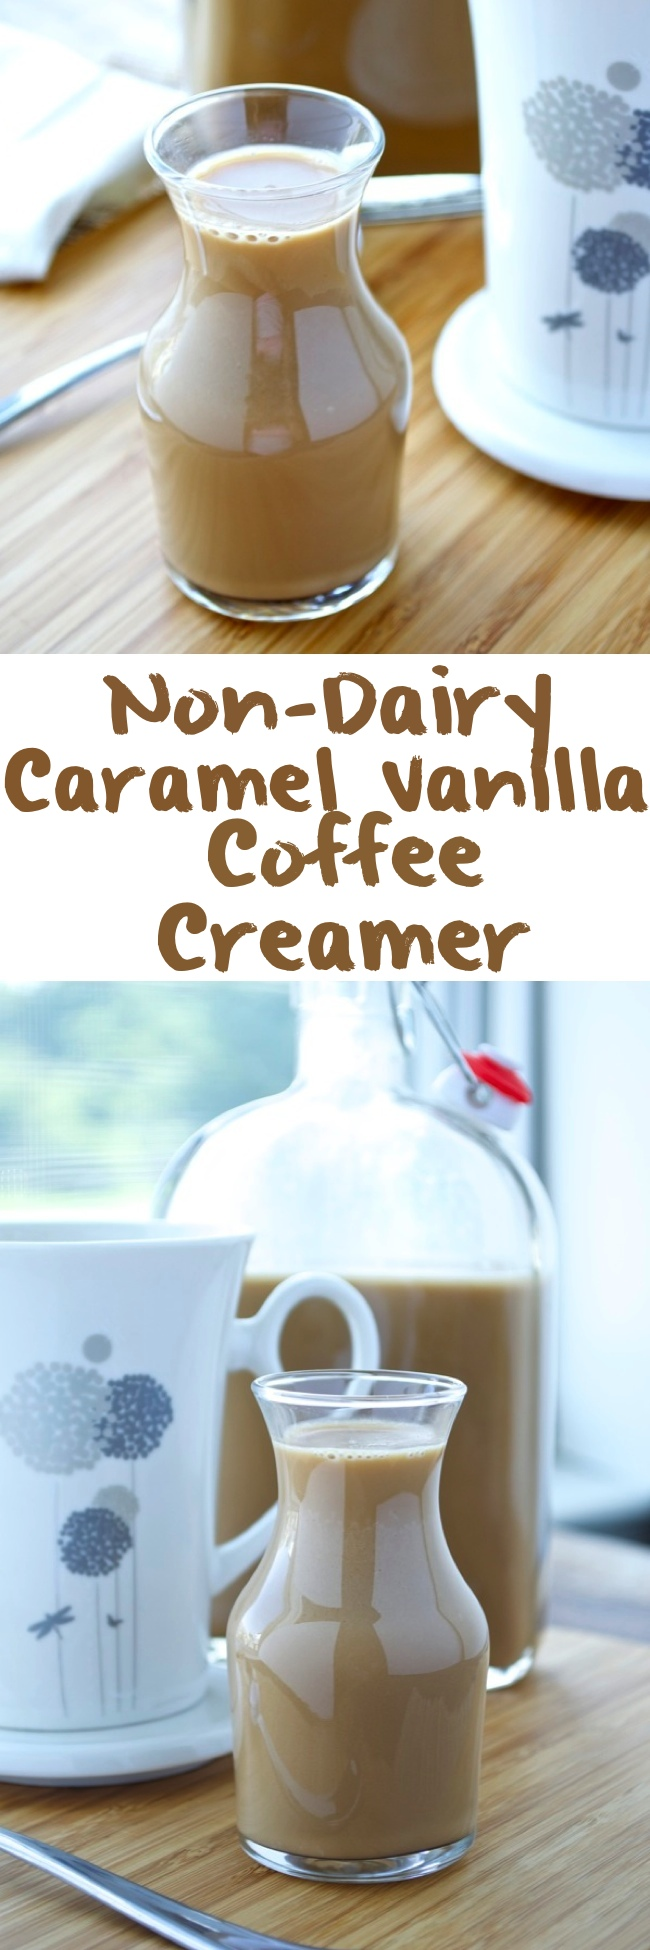 Caramel Vanilla Coffee Creamer Pin